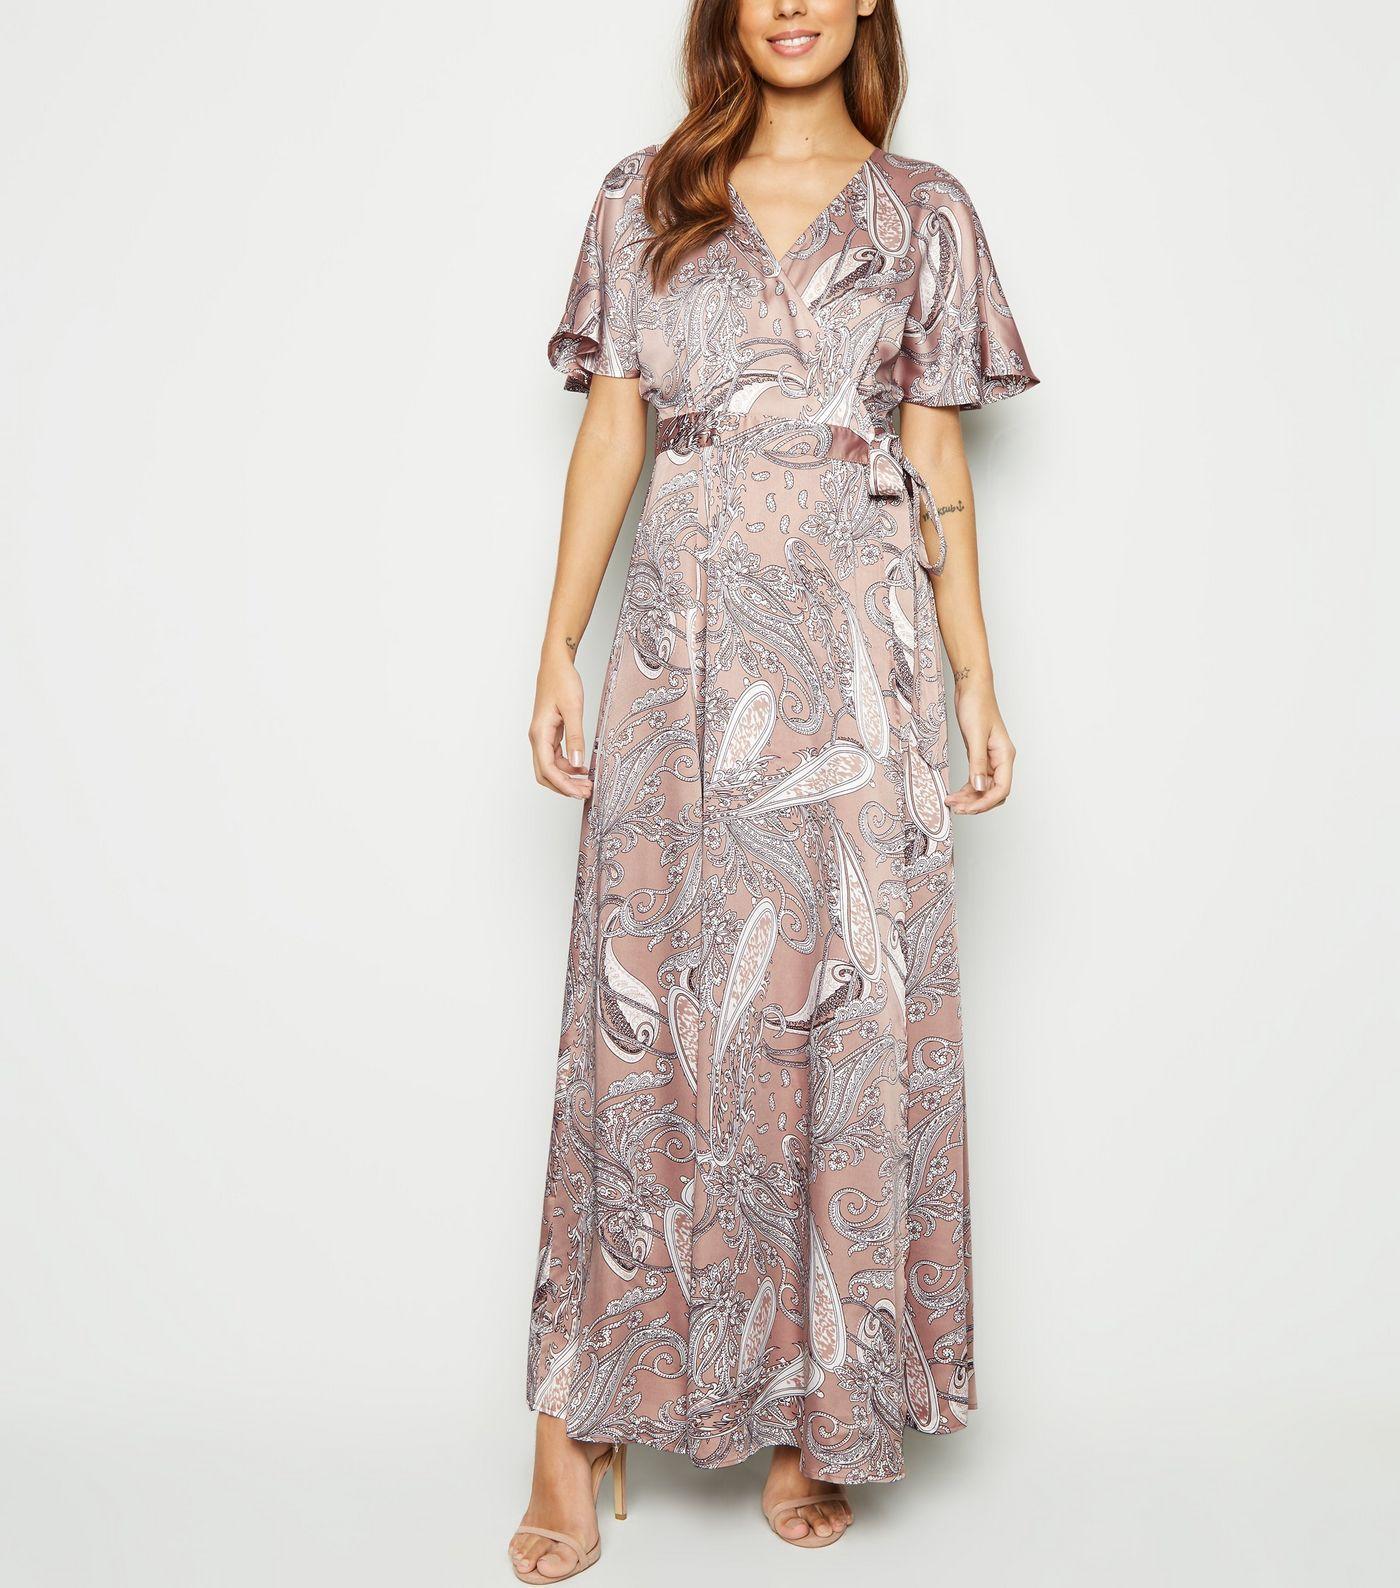 feccb0bd288 Blue Vanilla Pink Paisley Satin Wrap Maxi Dress in 2019